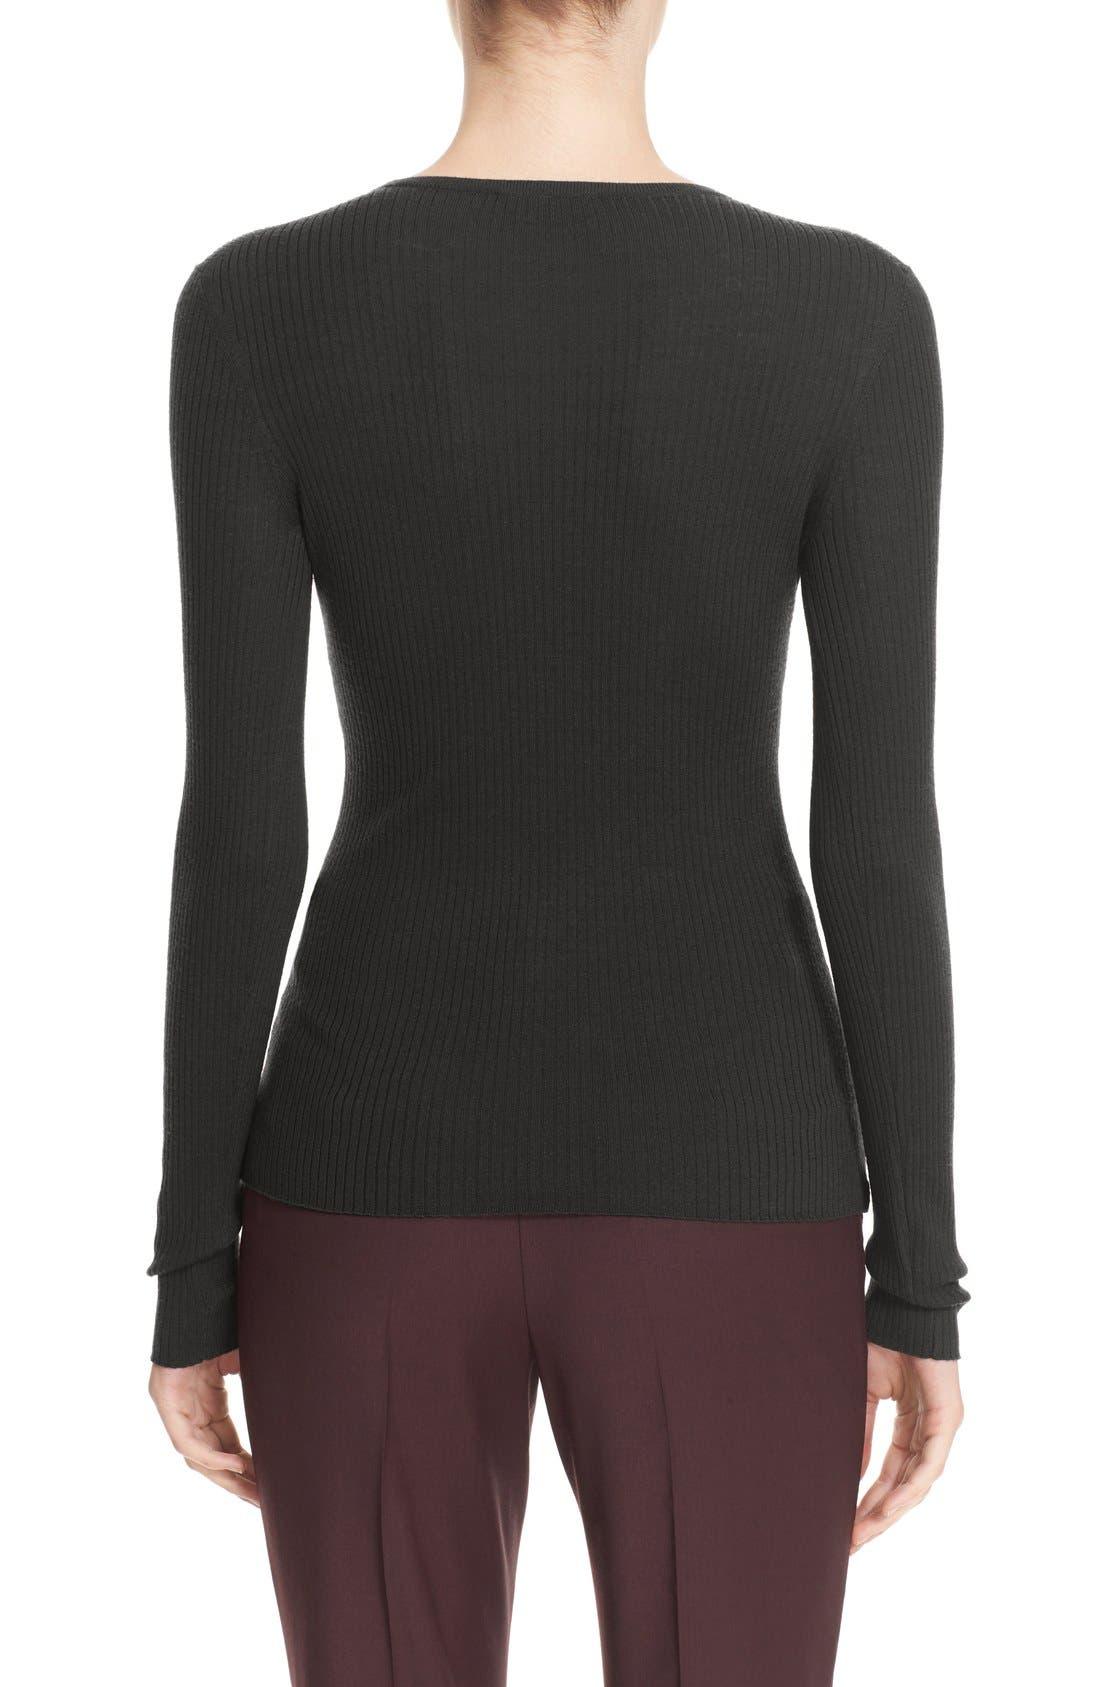 'Mirzi' Rib Knit Merino Wool Sweater,                             Alternate thumbnail 3, color,                             363